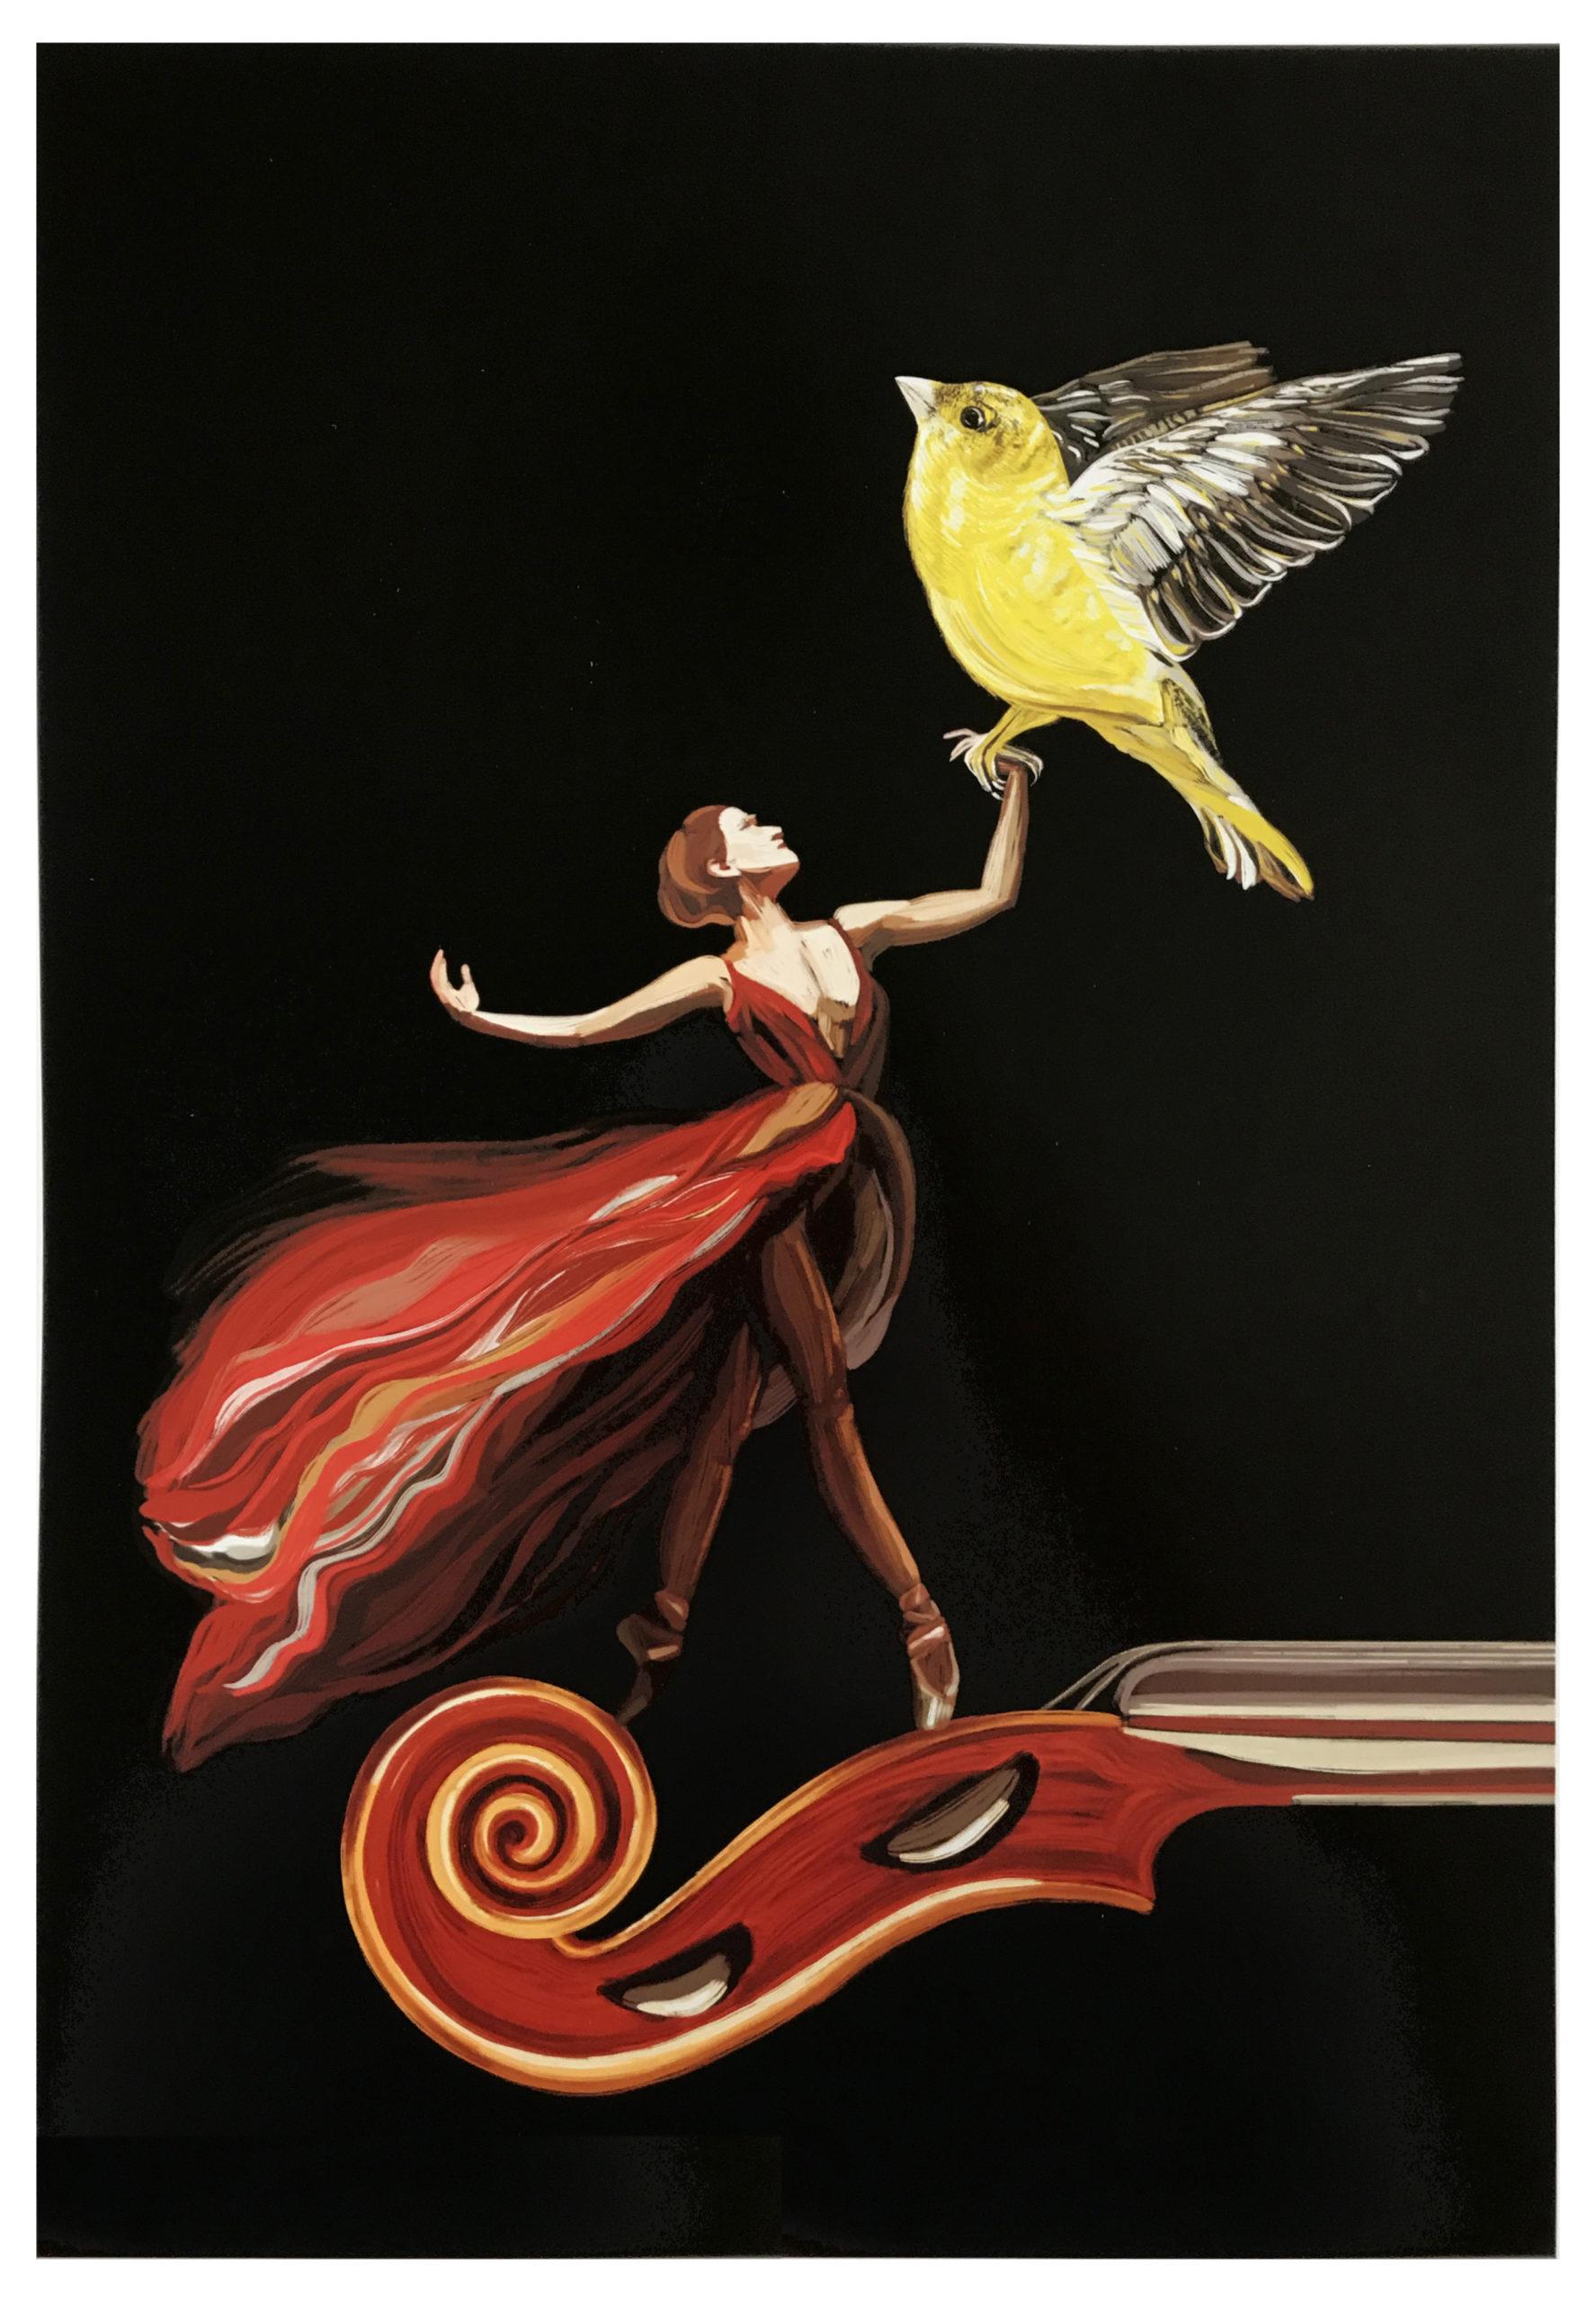 Vivaldi Four Seasons student artwork from MassArt, Emma Sudak